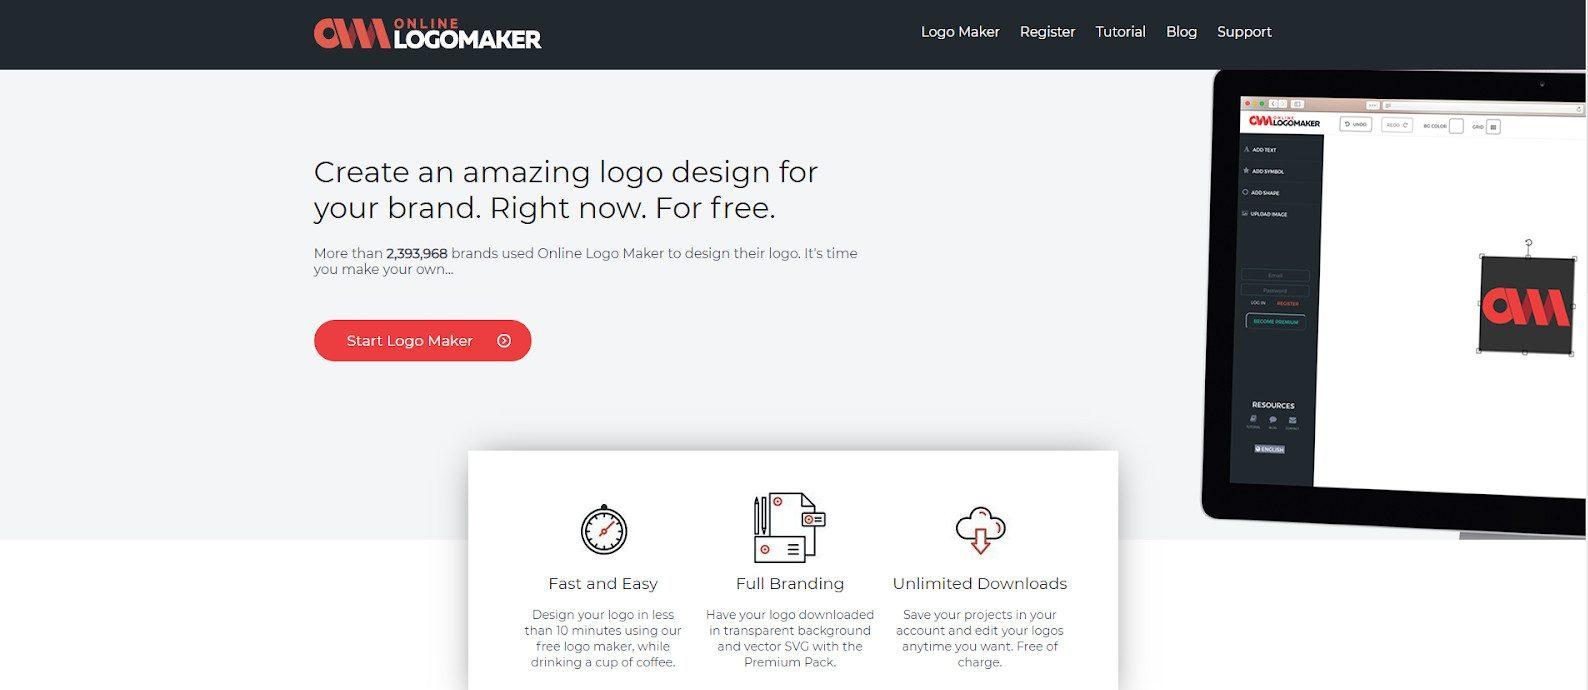 Online Logo Maker homepage